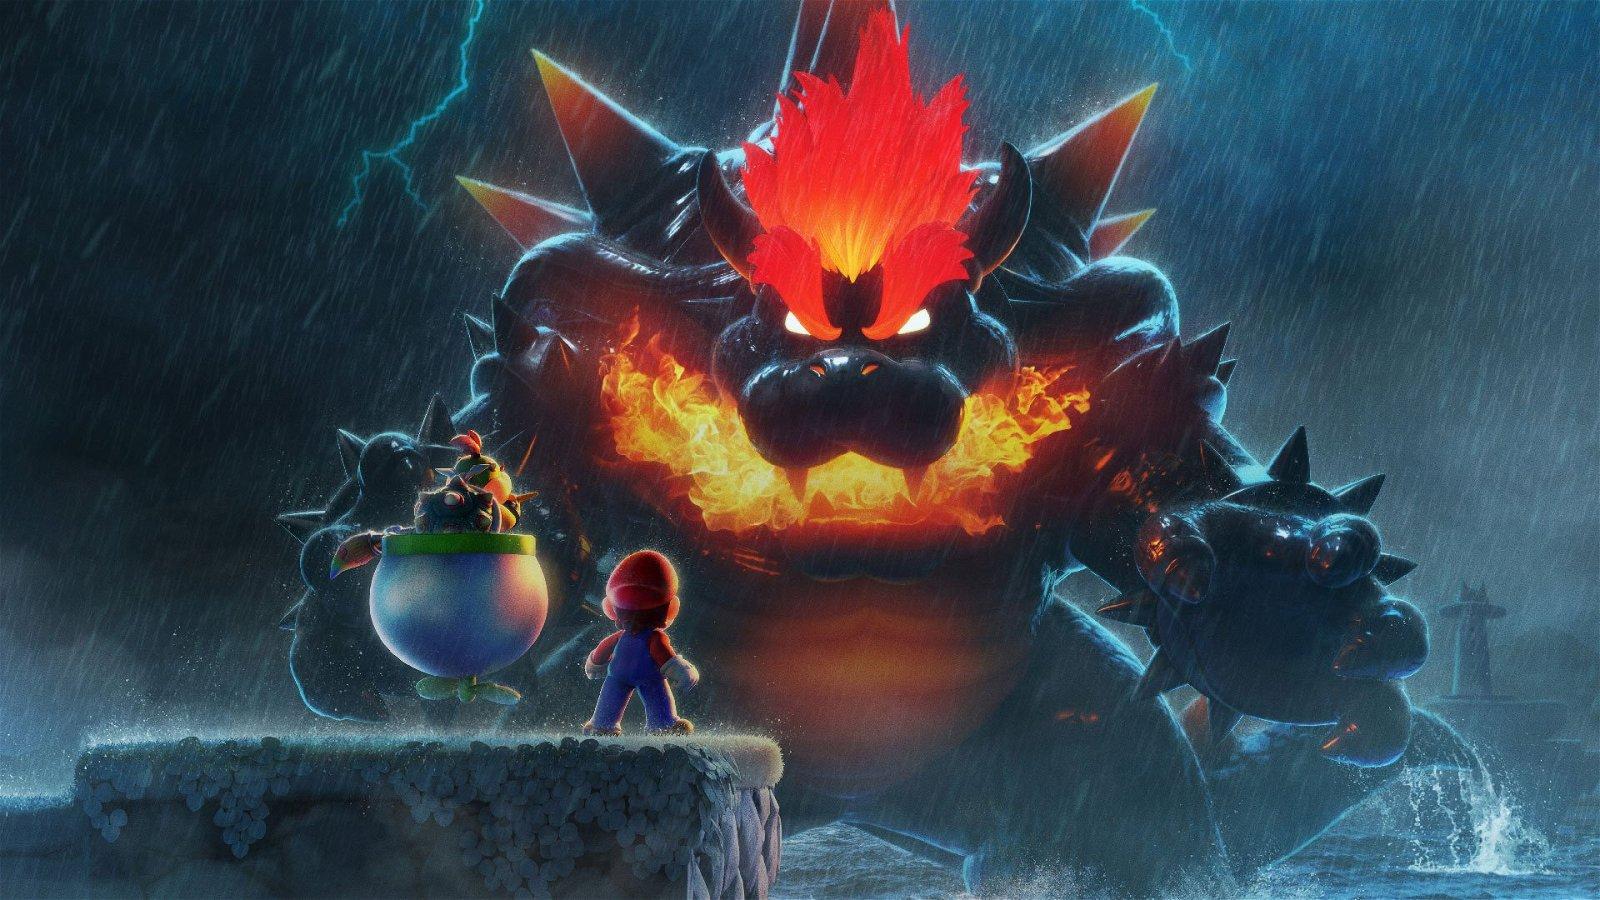 Super Mario 3D World Reveals Bowser's Fury 1